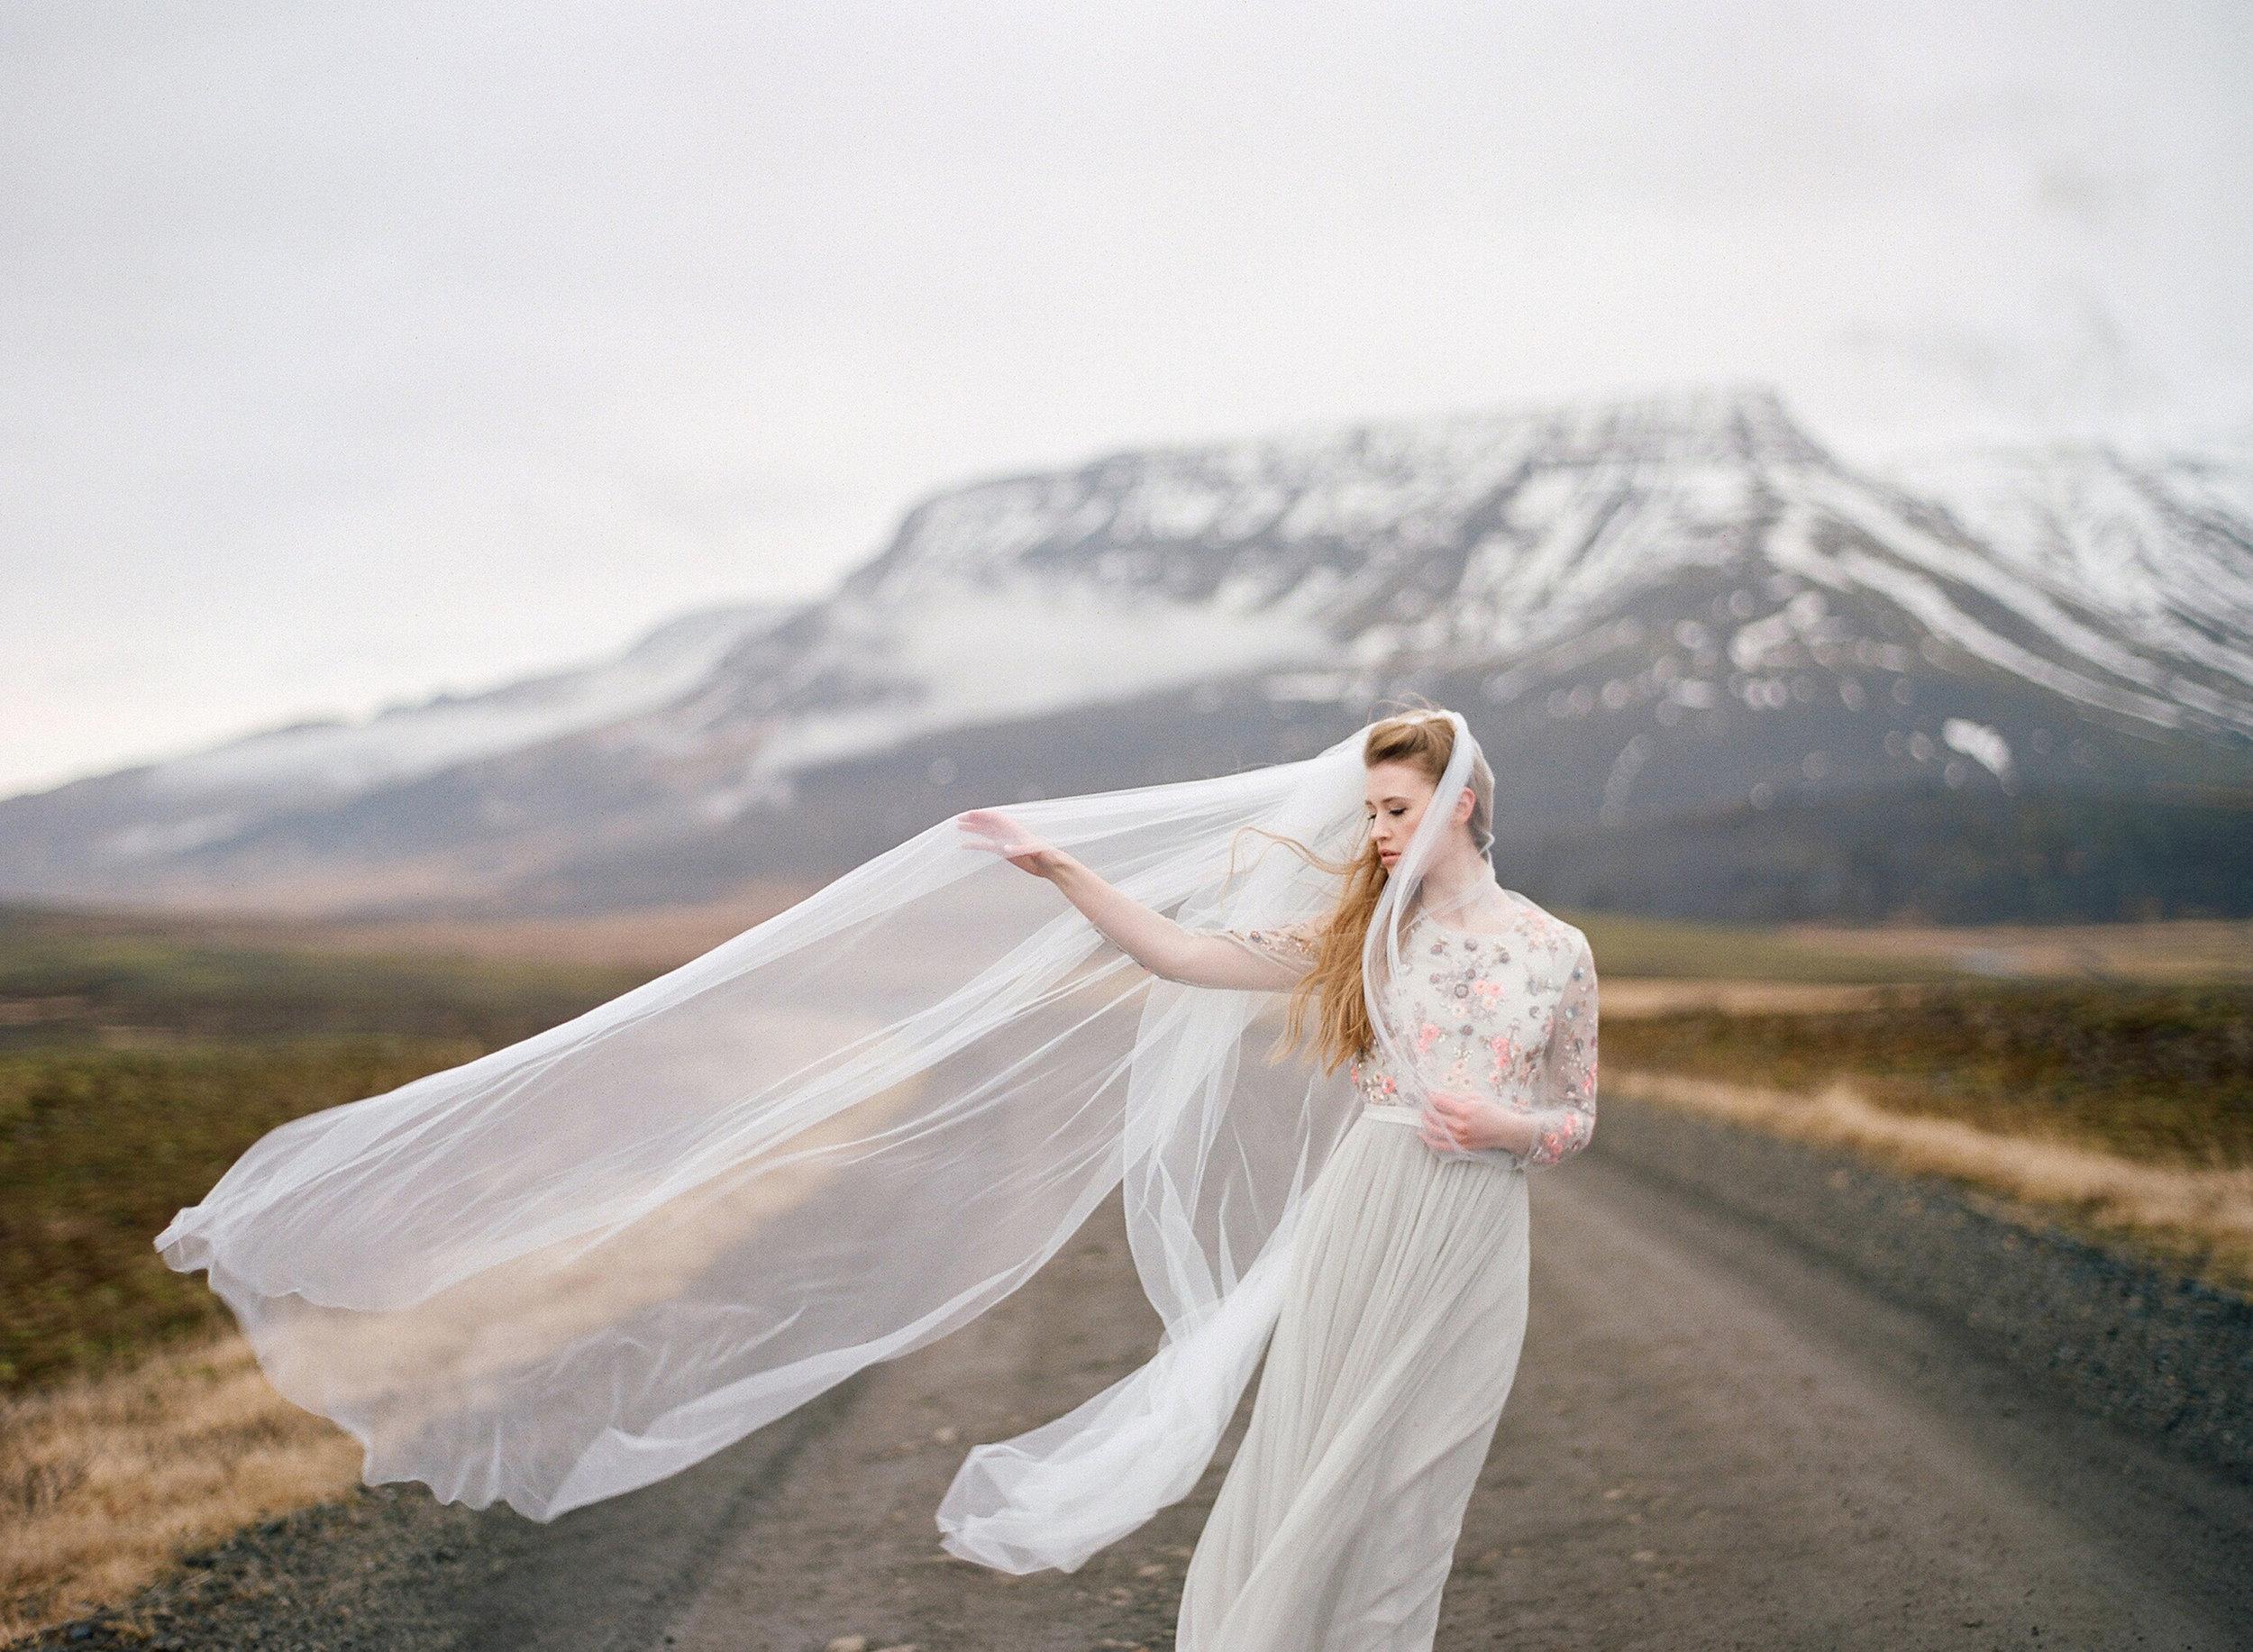 008_Iceland.jpg